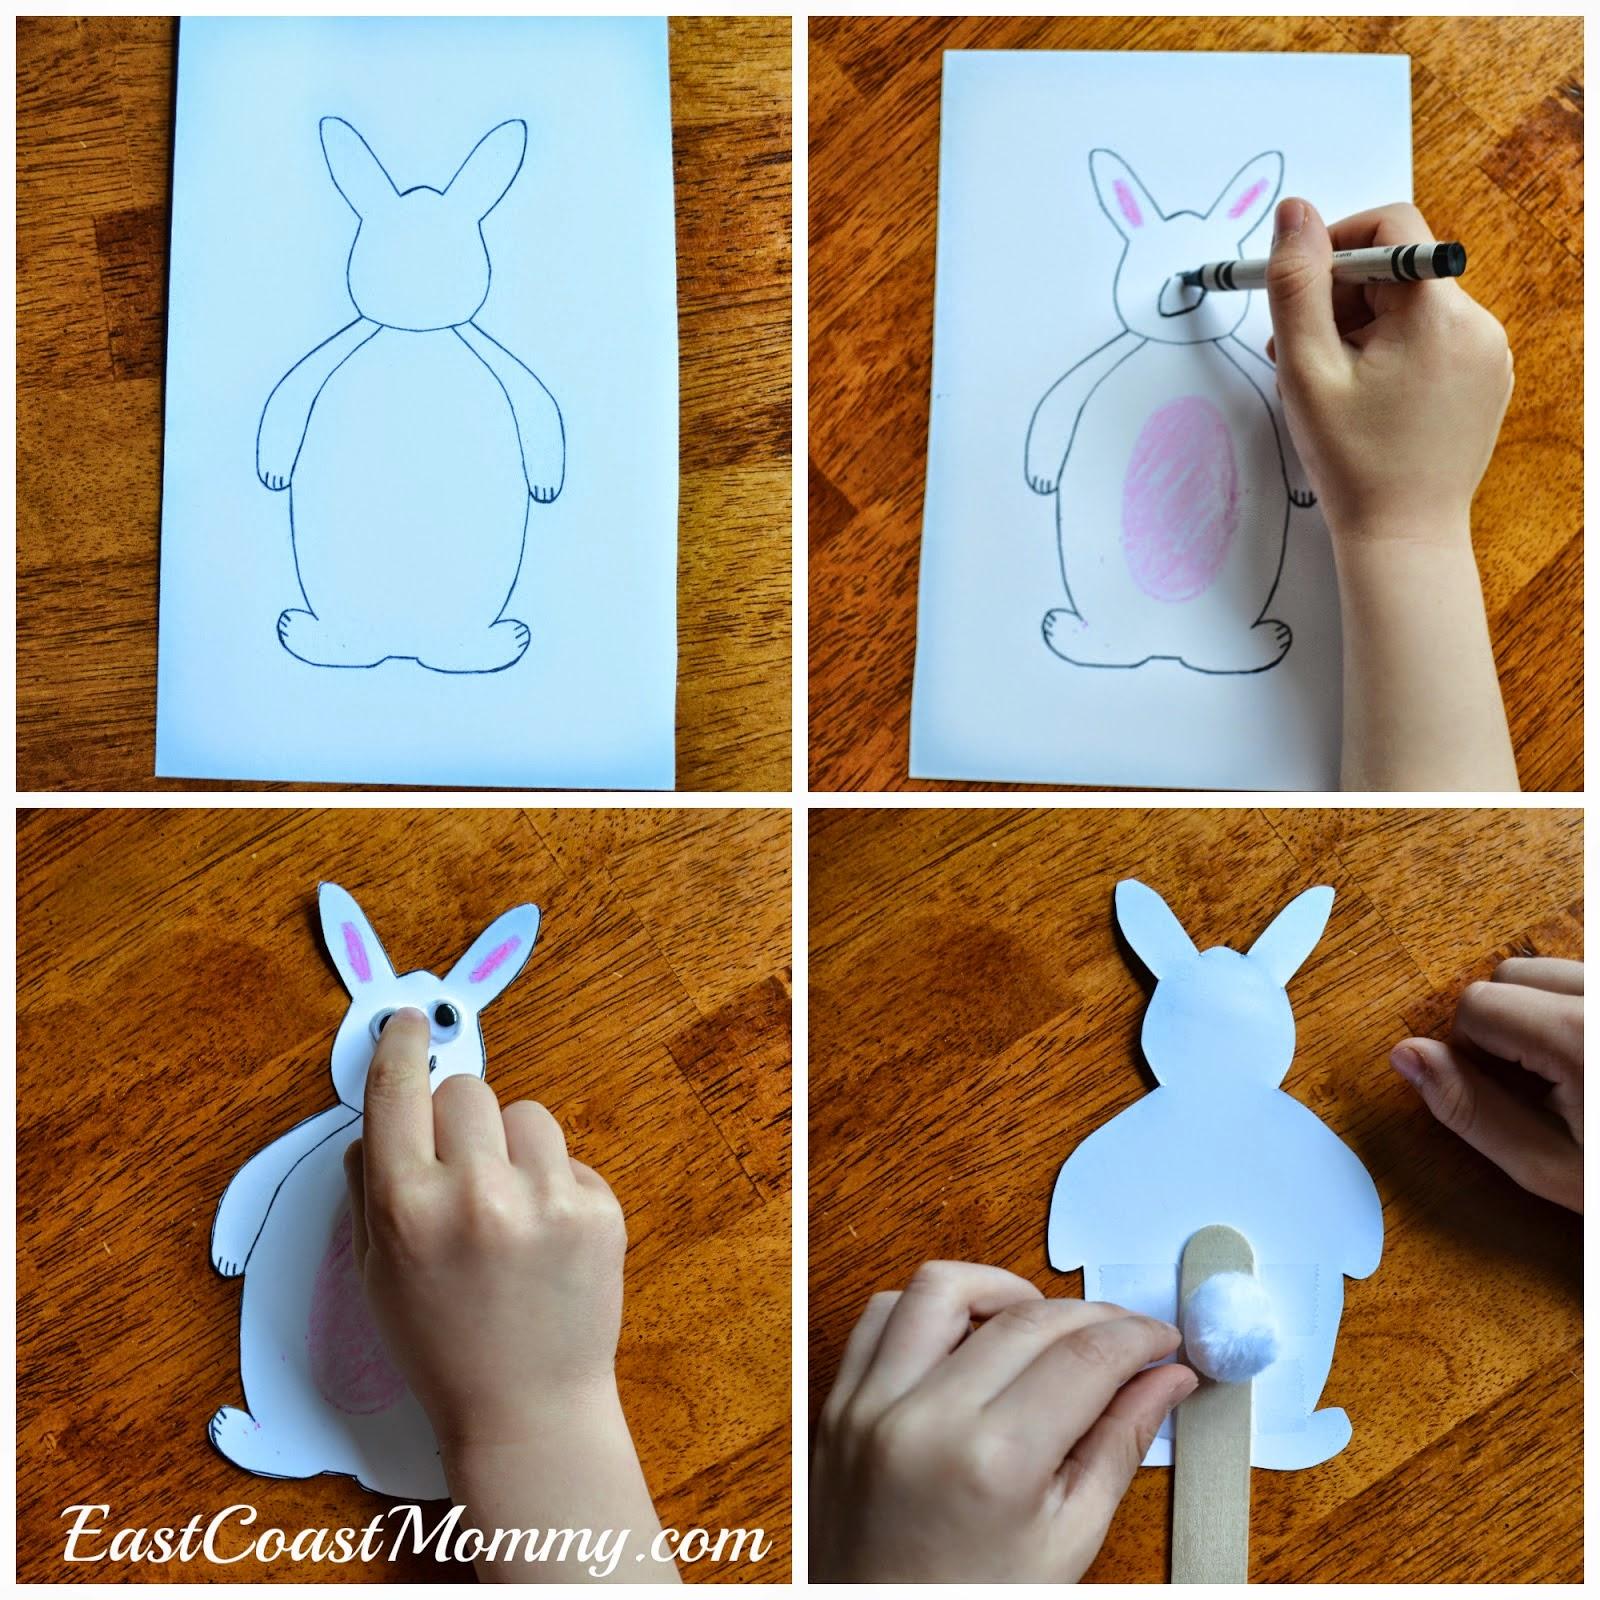 East Coast Mommy 10 Eggceptional Easter Printables